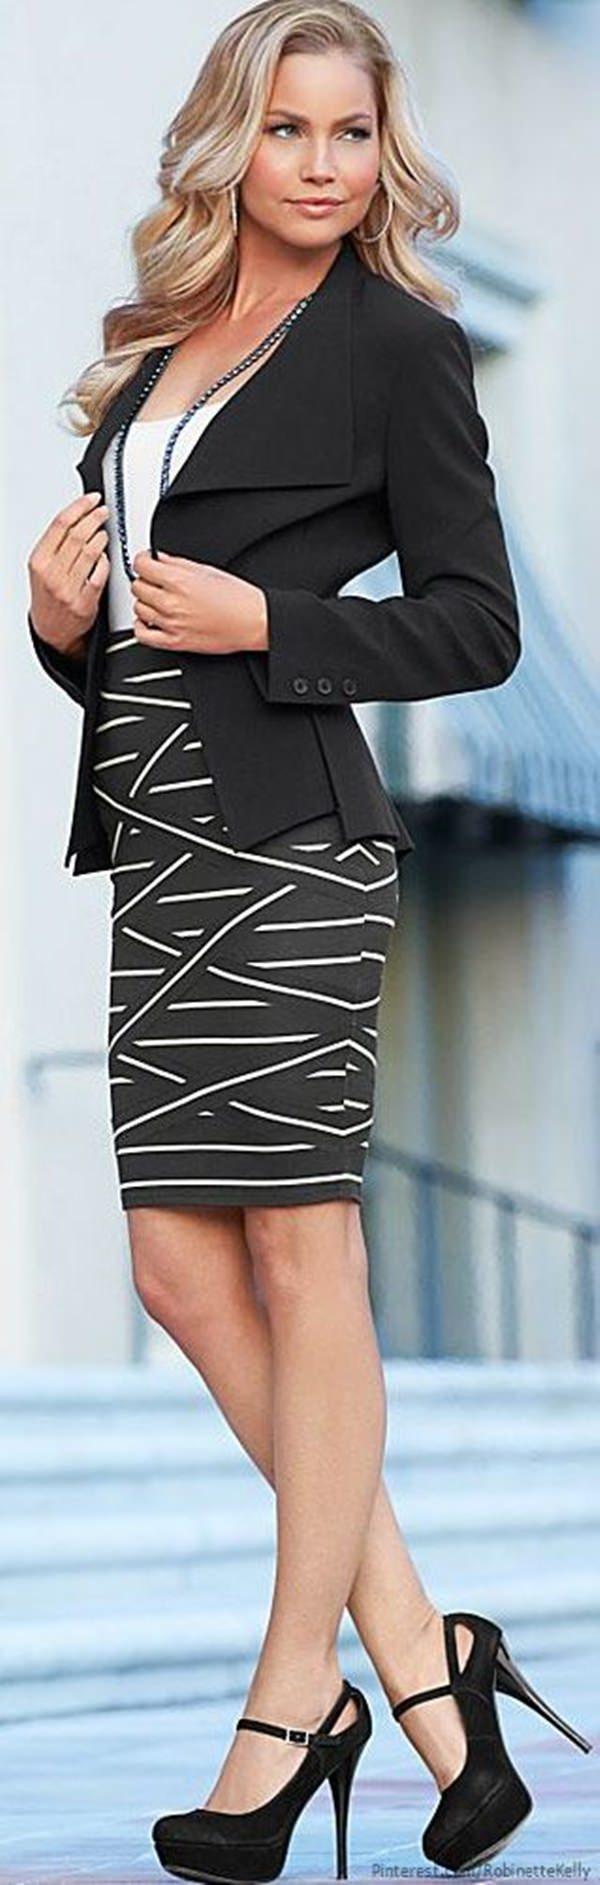 trajes de falda lápiz 36